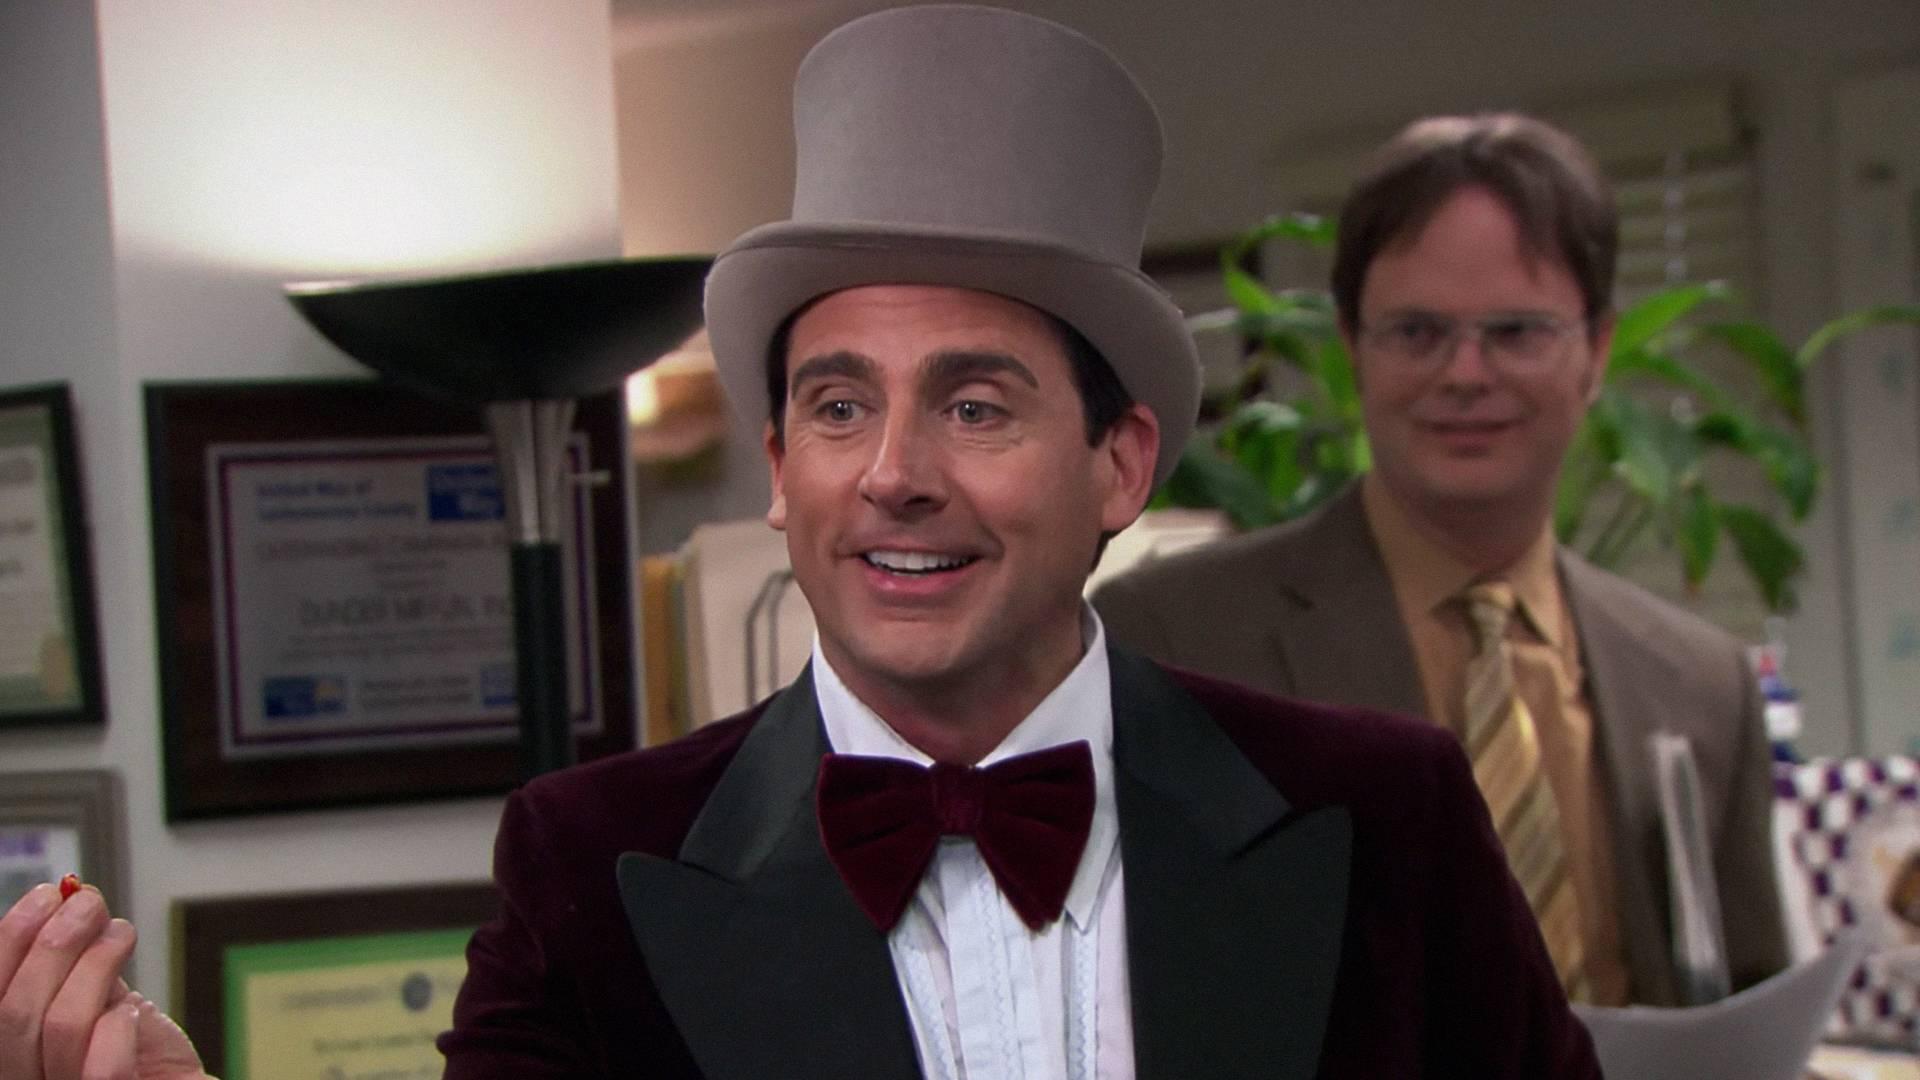 The Office Season 5 Episode 19